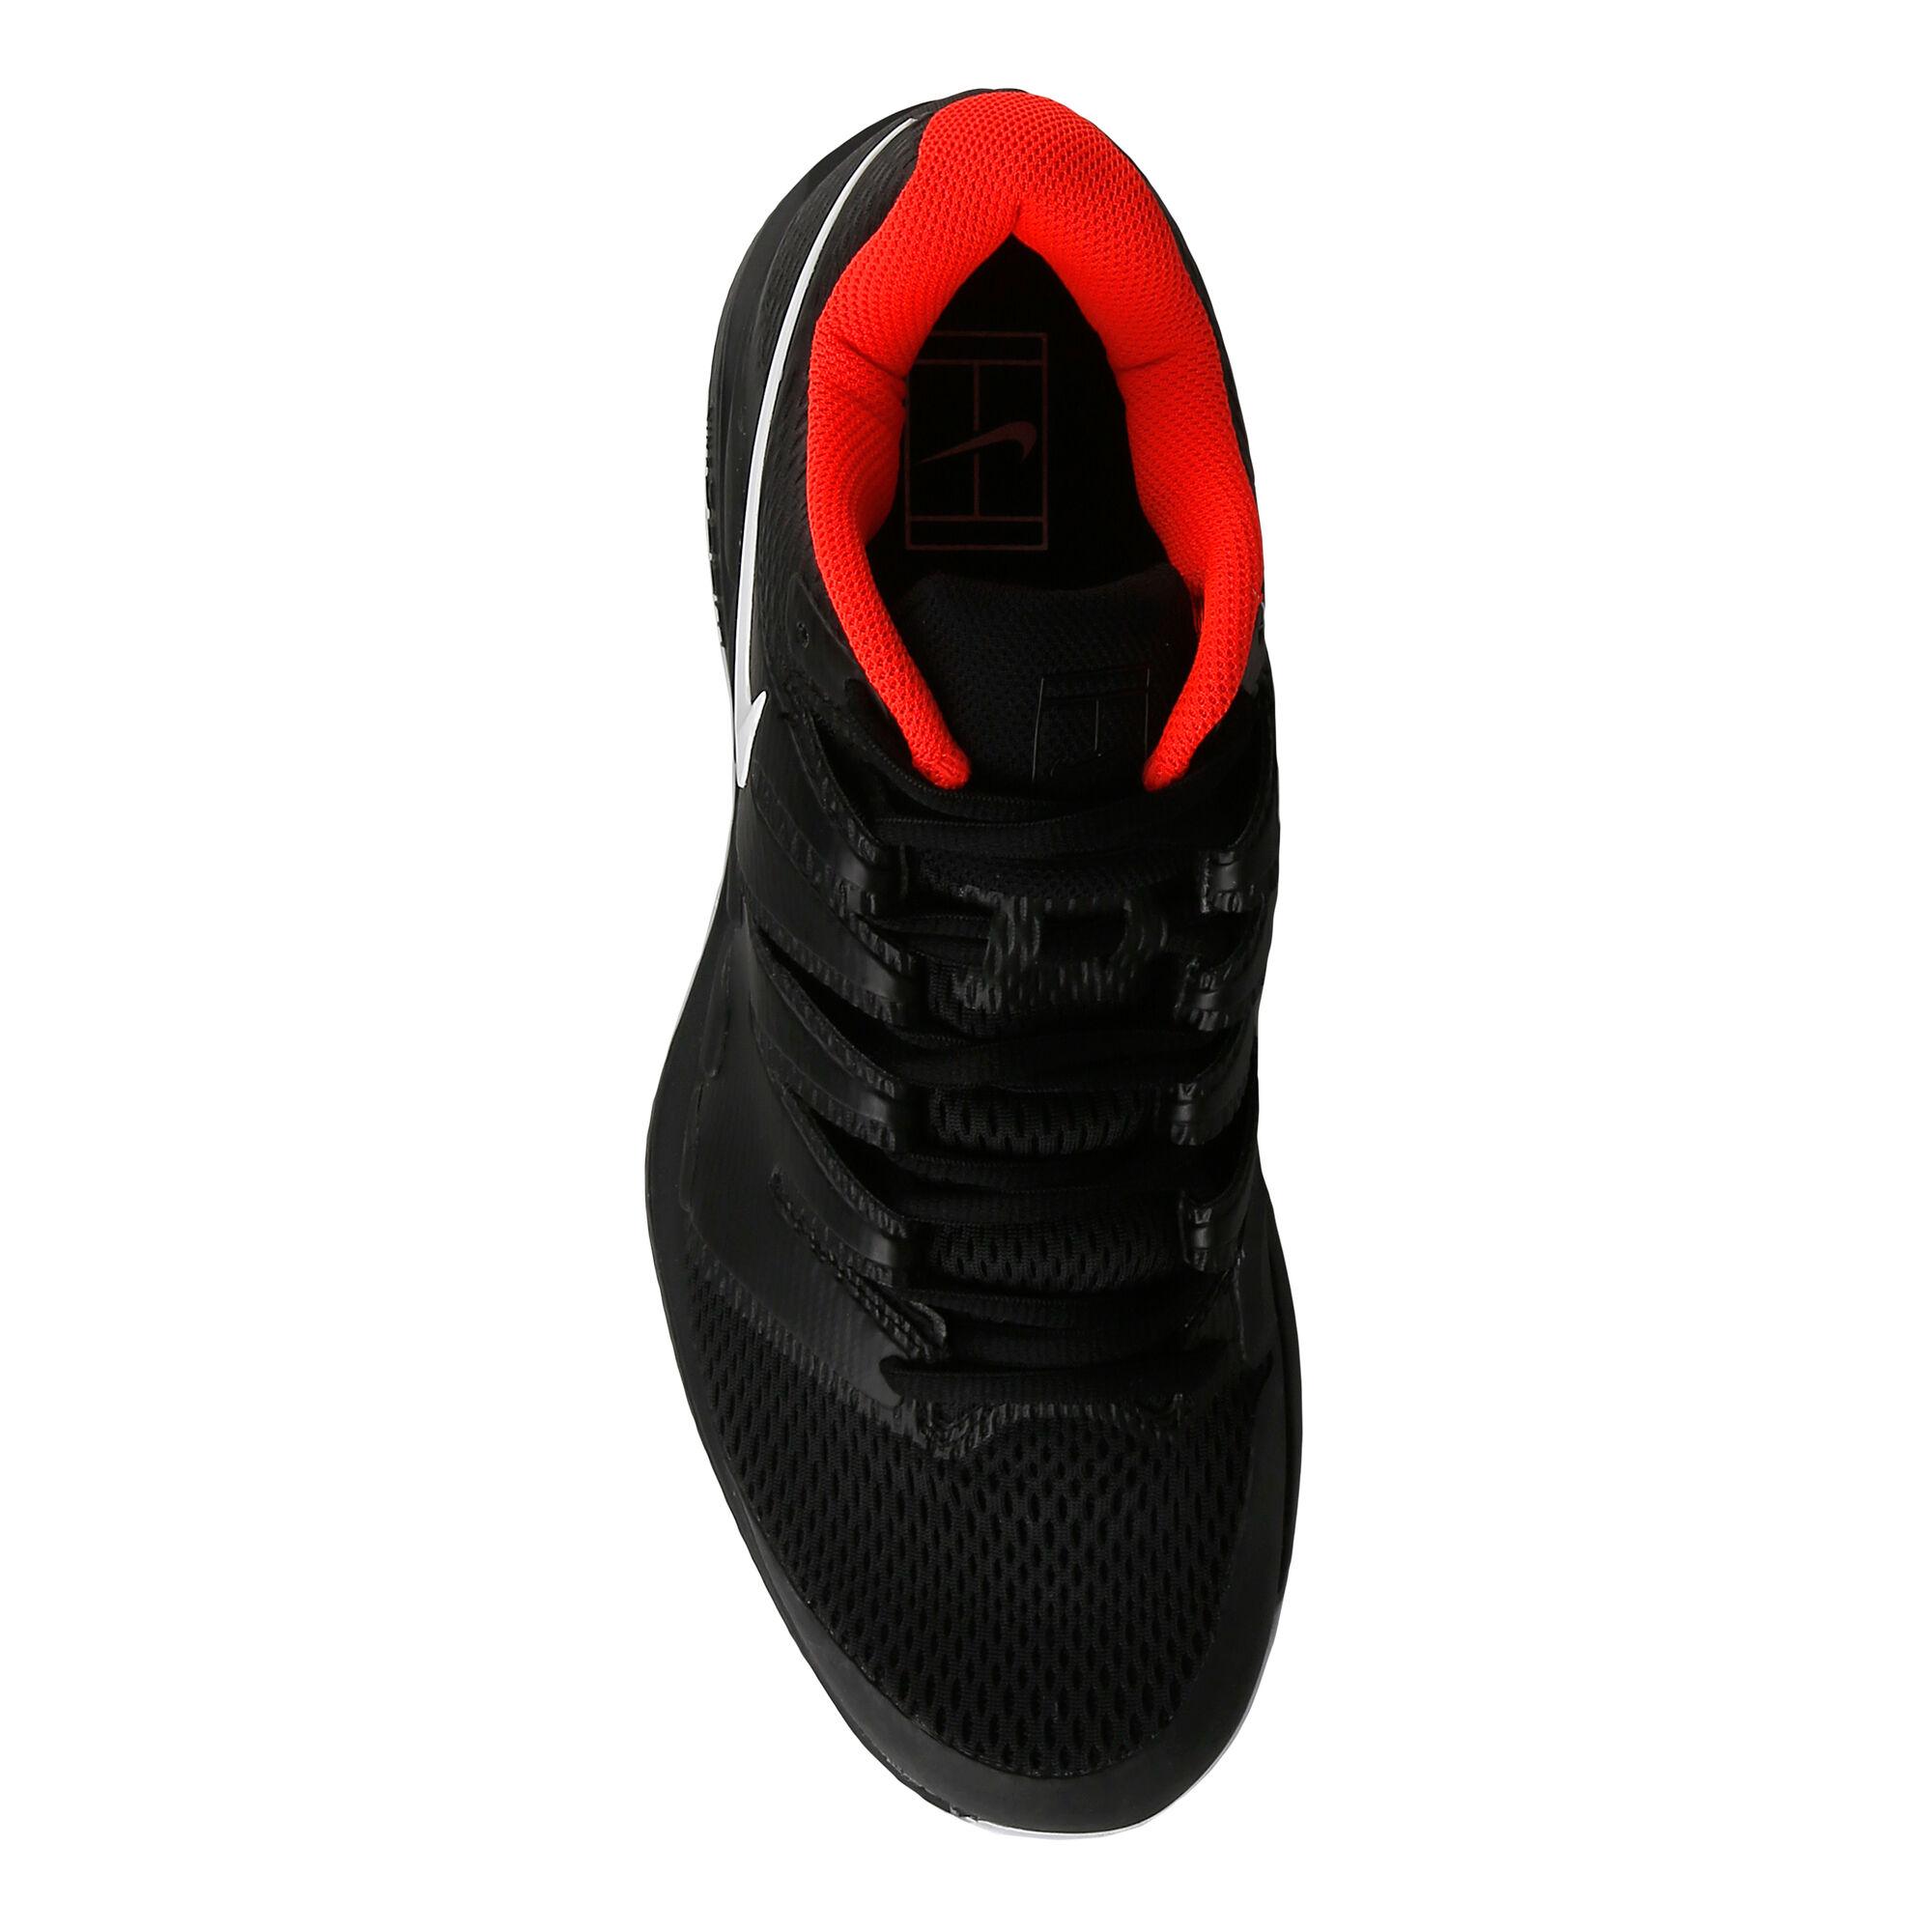 special sales discount exclusive deals Nike Air Zoom Vapor X HC Allcourtschuh Herren - Schwarz, Rot ...